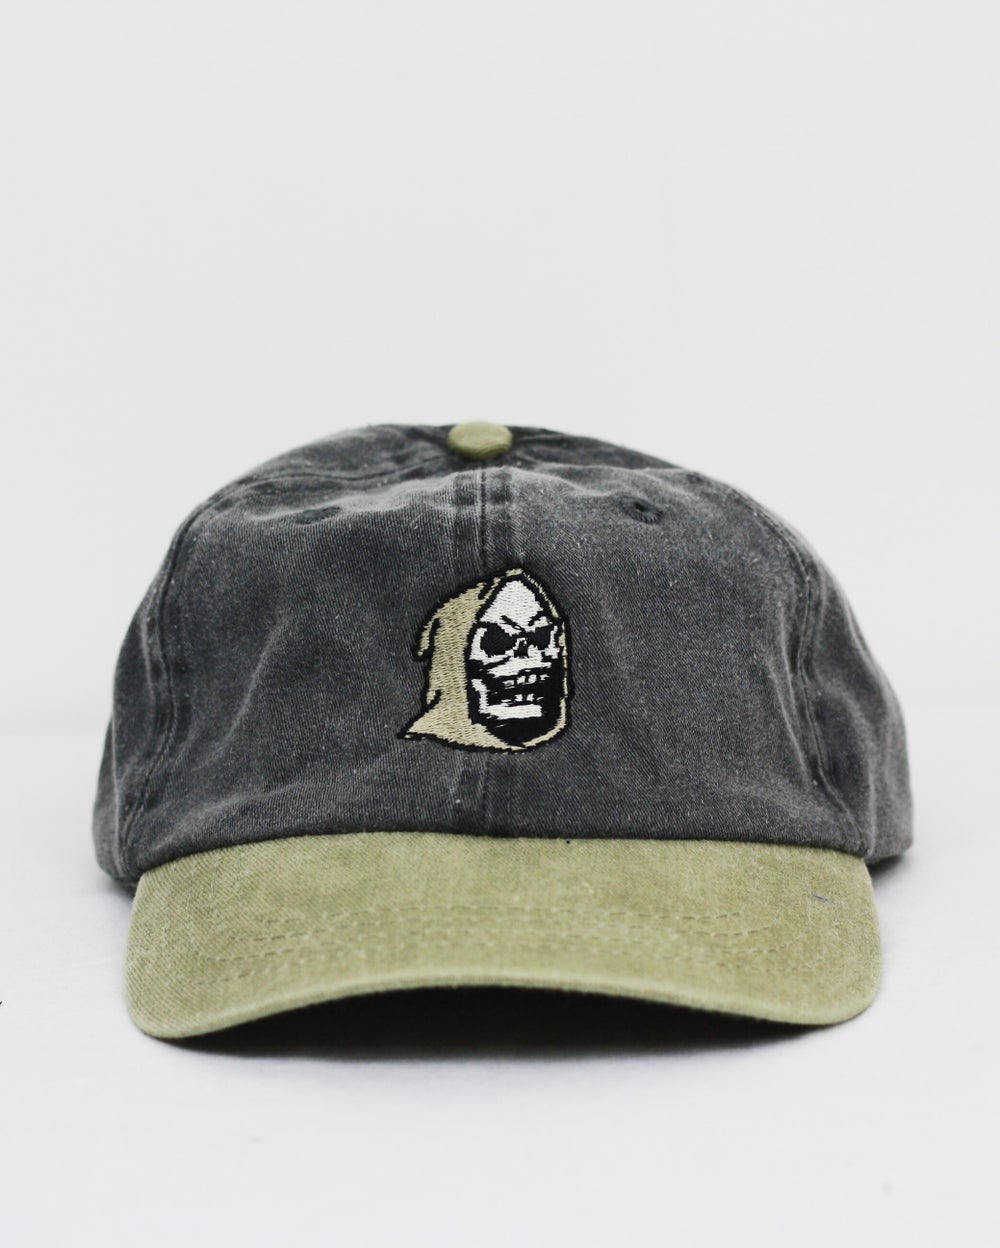 Image of SKELE-TOR CAP - TAN / CHARCOAL GREY